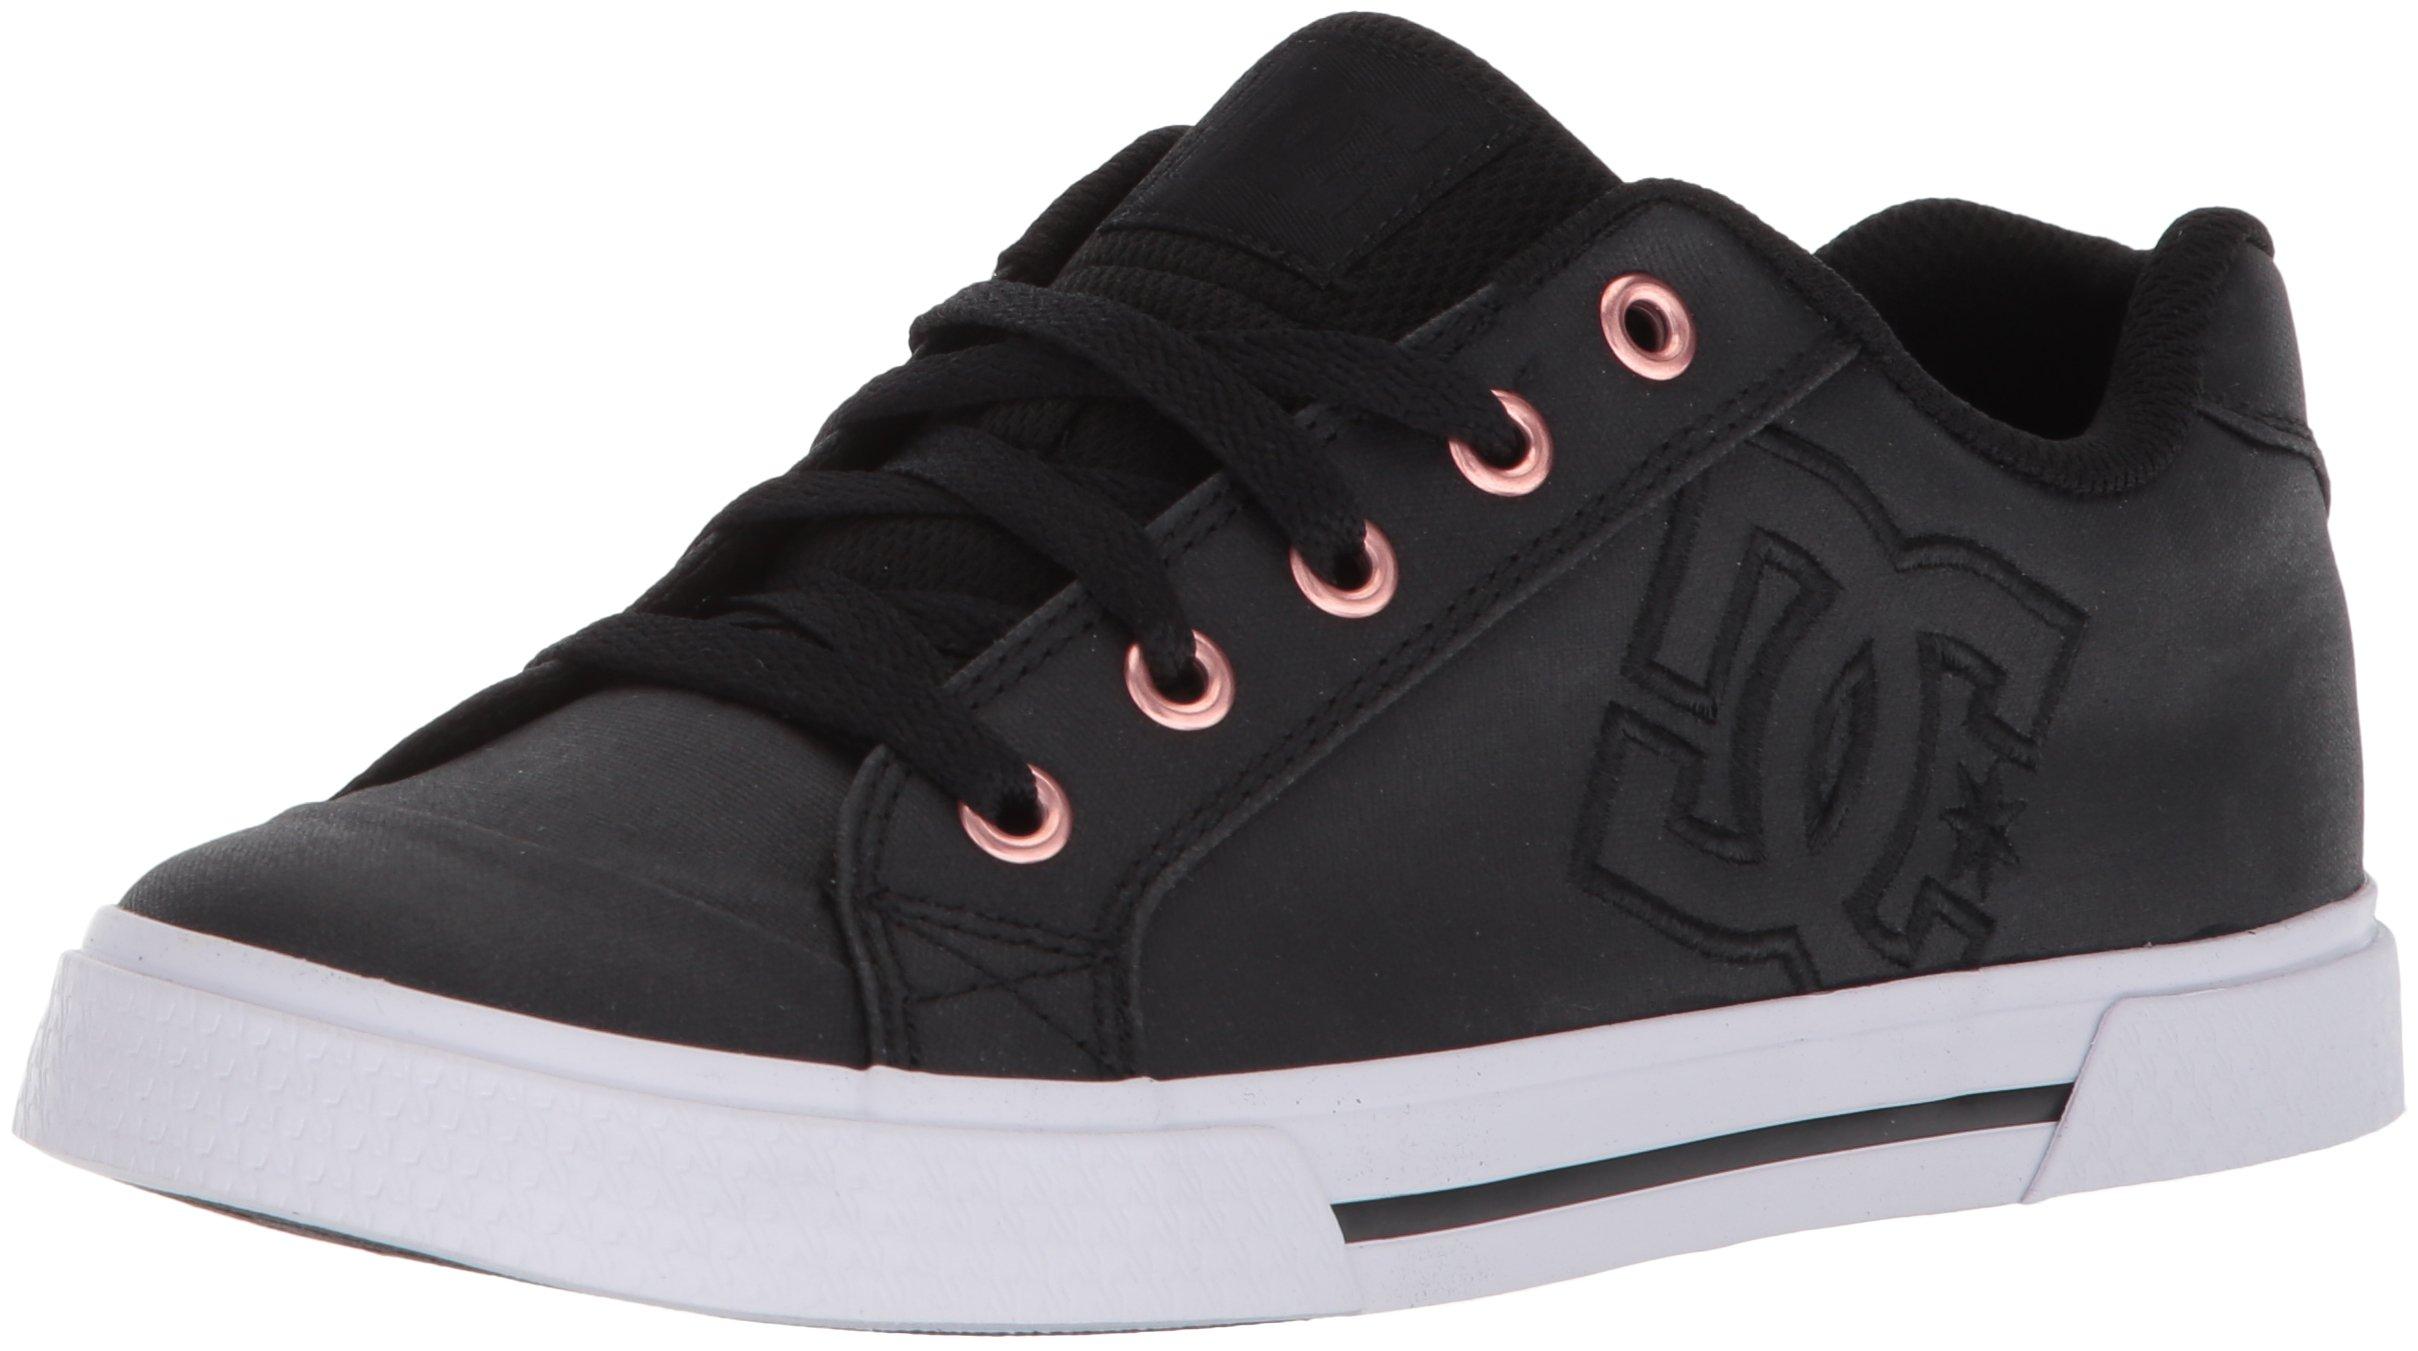 DC Women's Chelsea TX SE Skate Shoe, Black/Black/White, 8 B US by DC (Image #1)